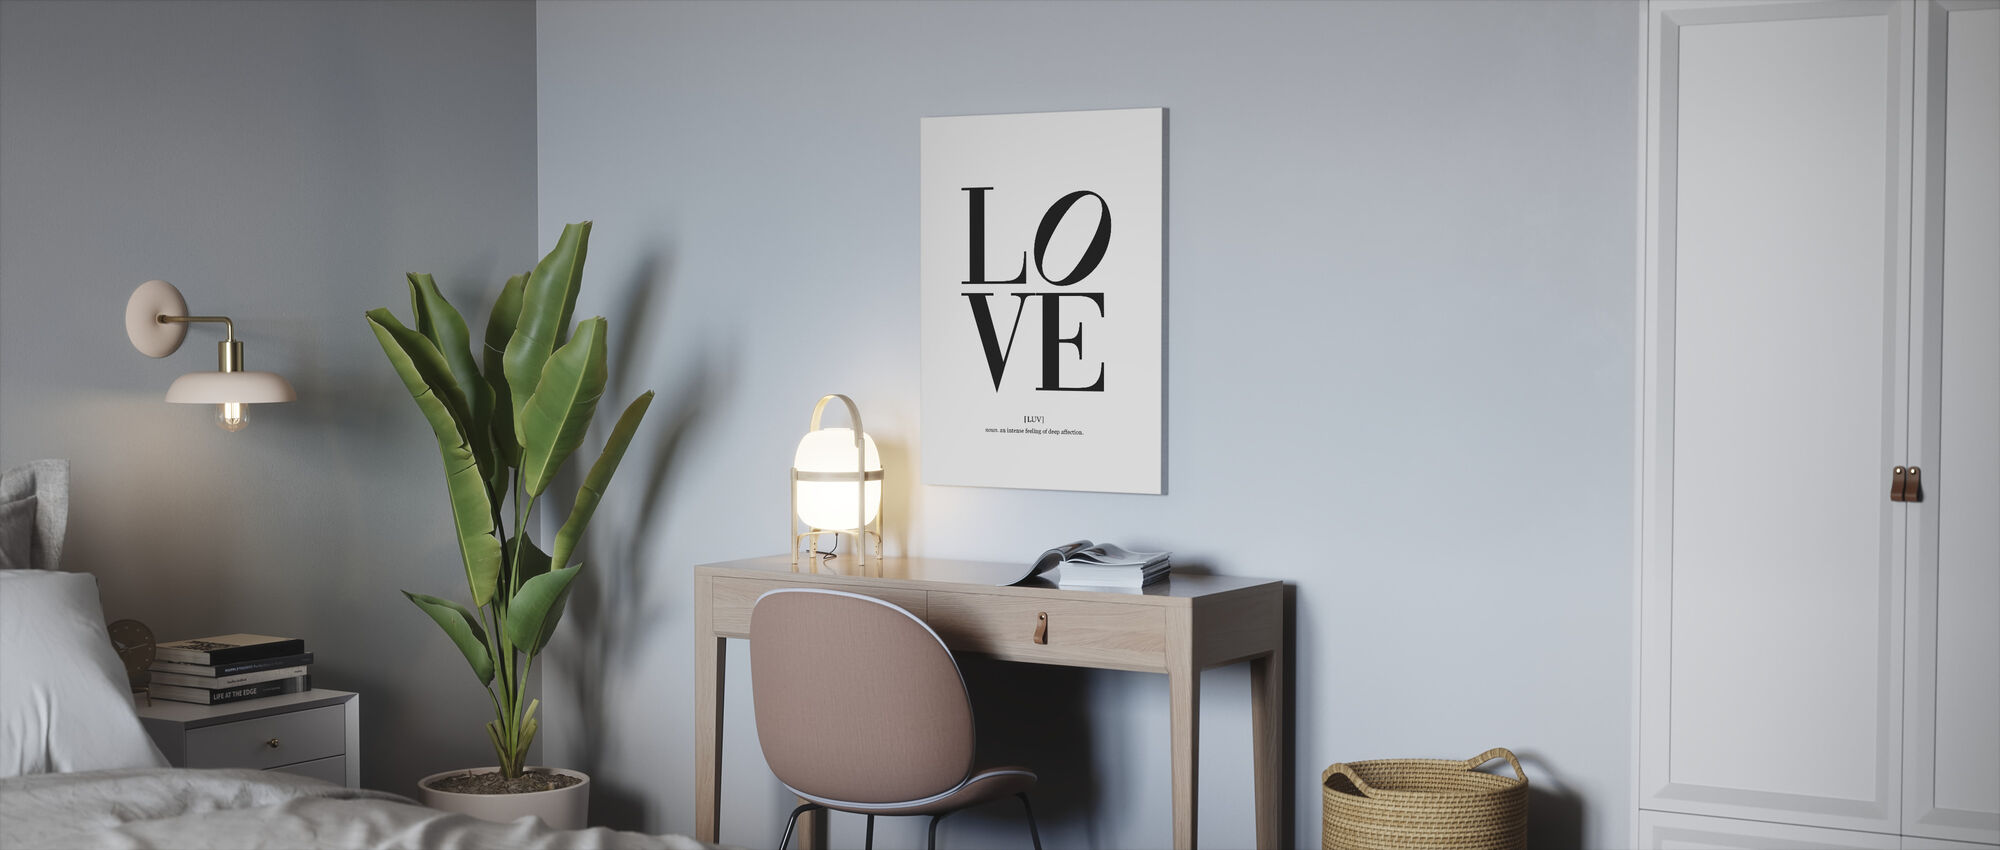 Love - Deep Affection - Canvas print - Office